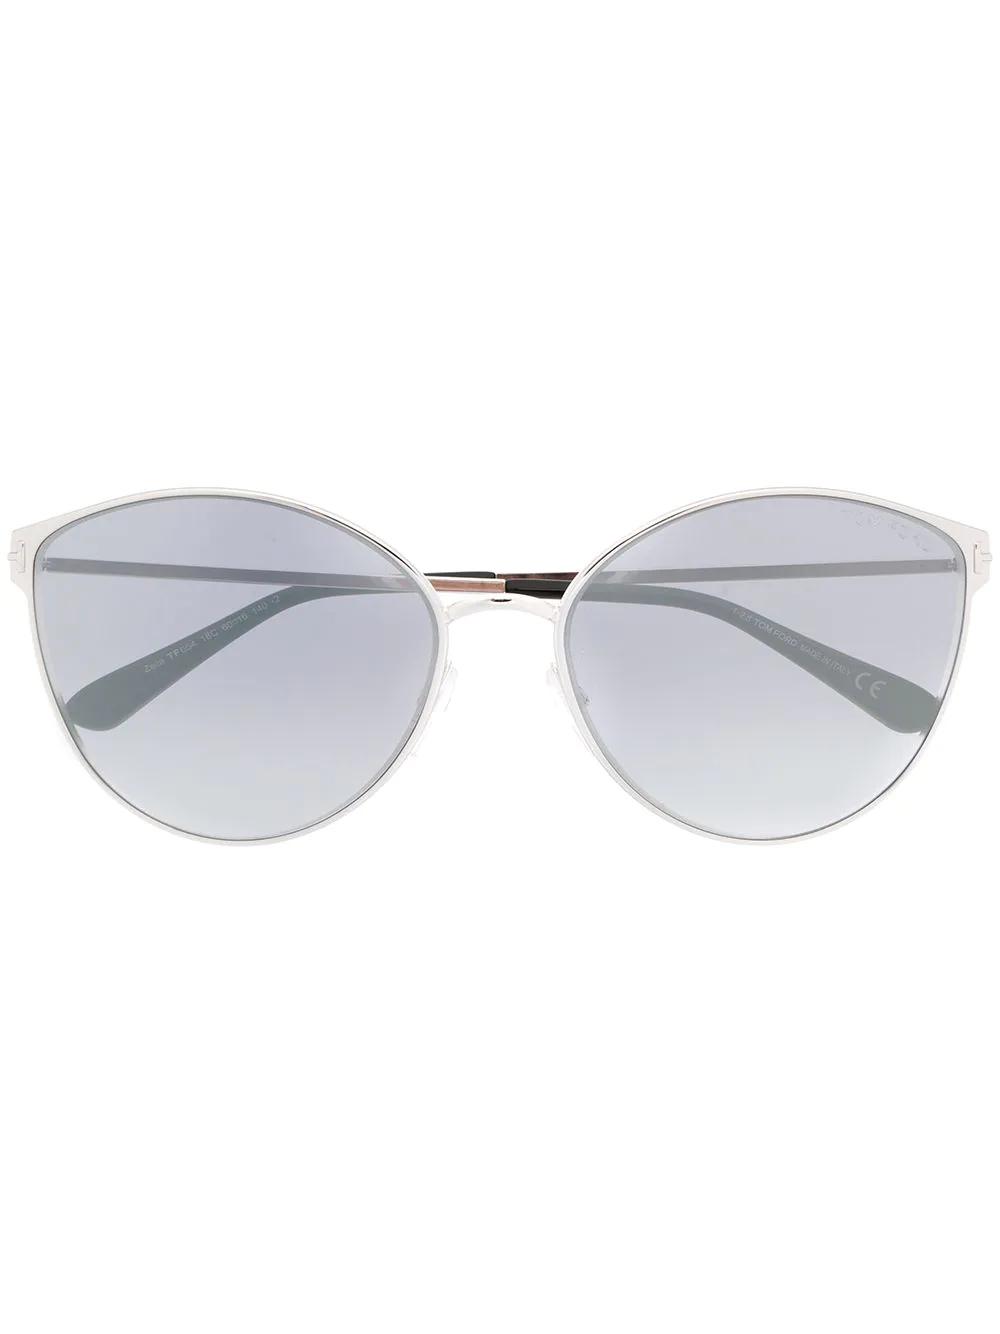 Tom Ford | солнцезащитные очки 'Zeila' | Clouty